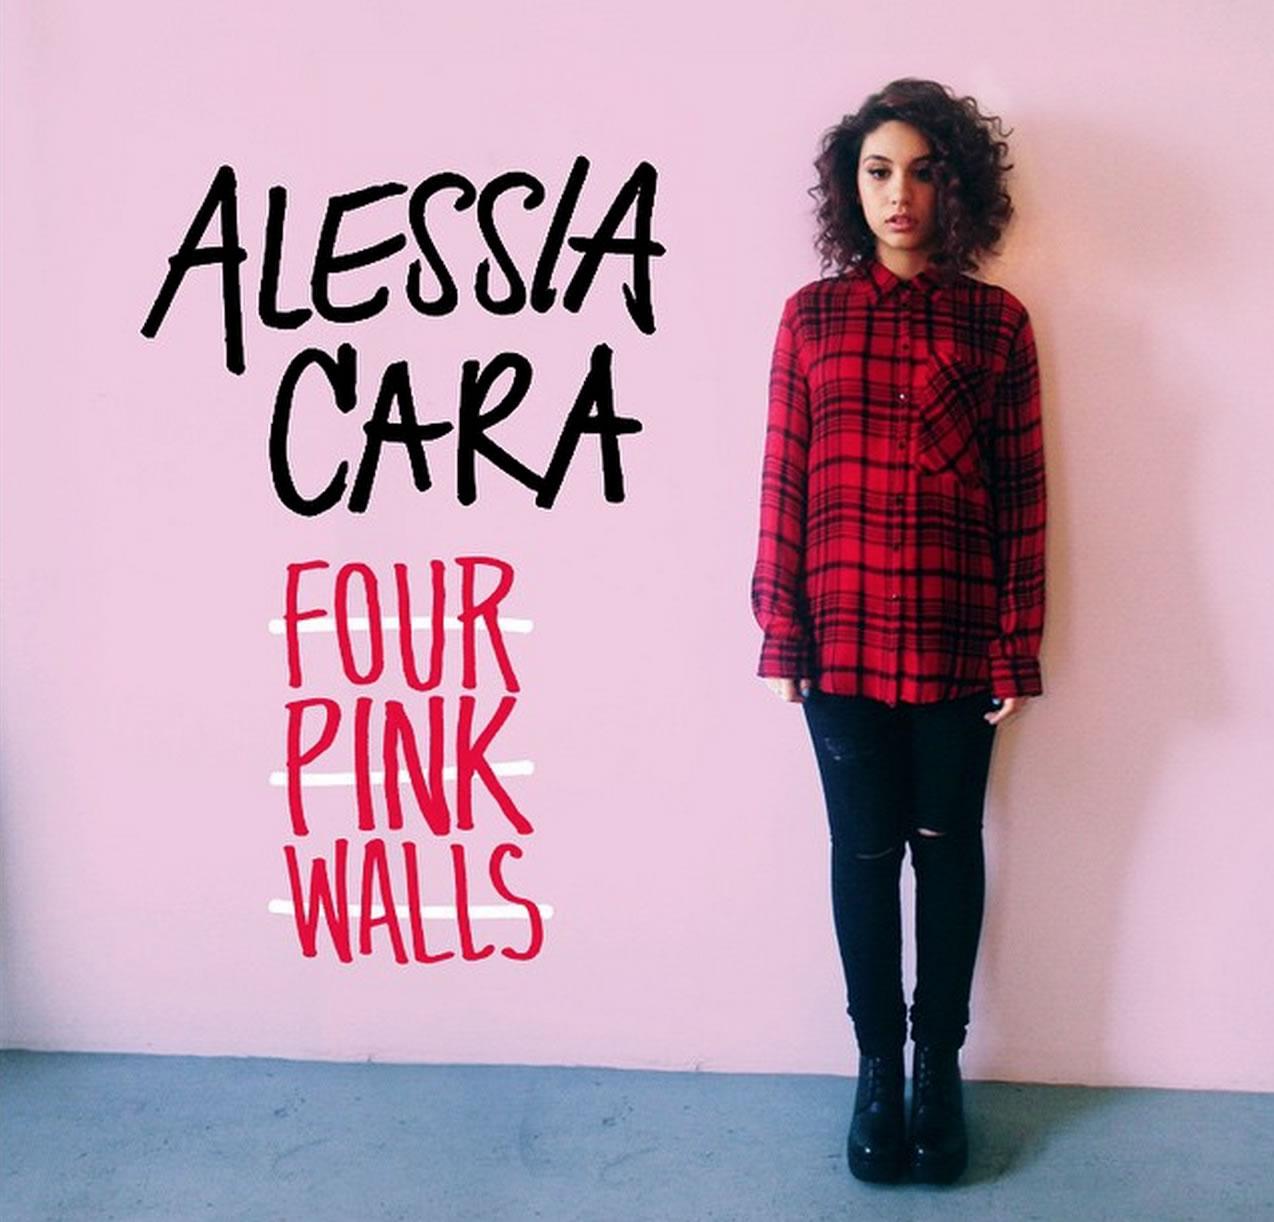 Alessia-Cara-4-Pink-Walls